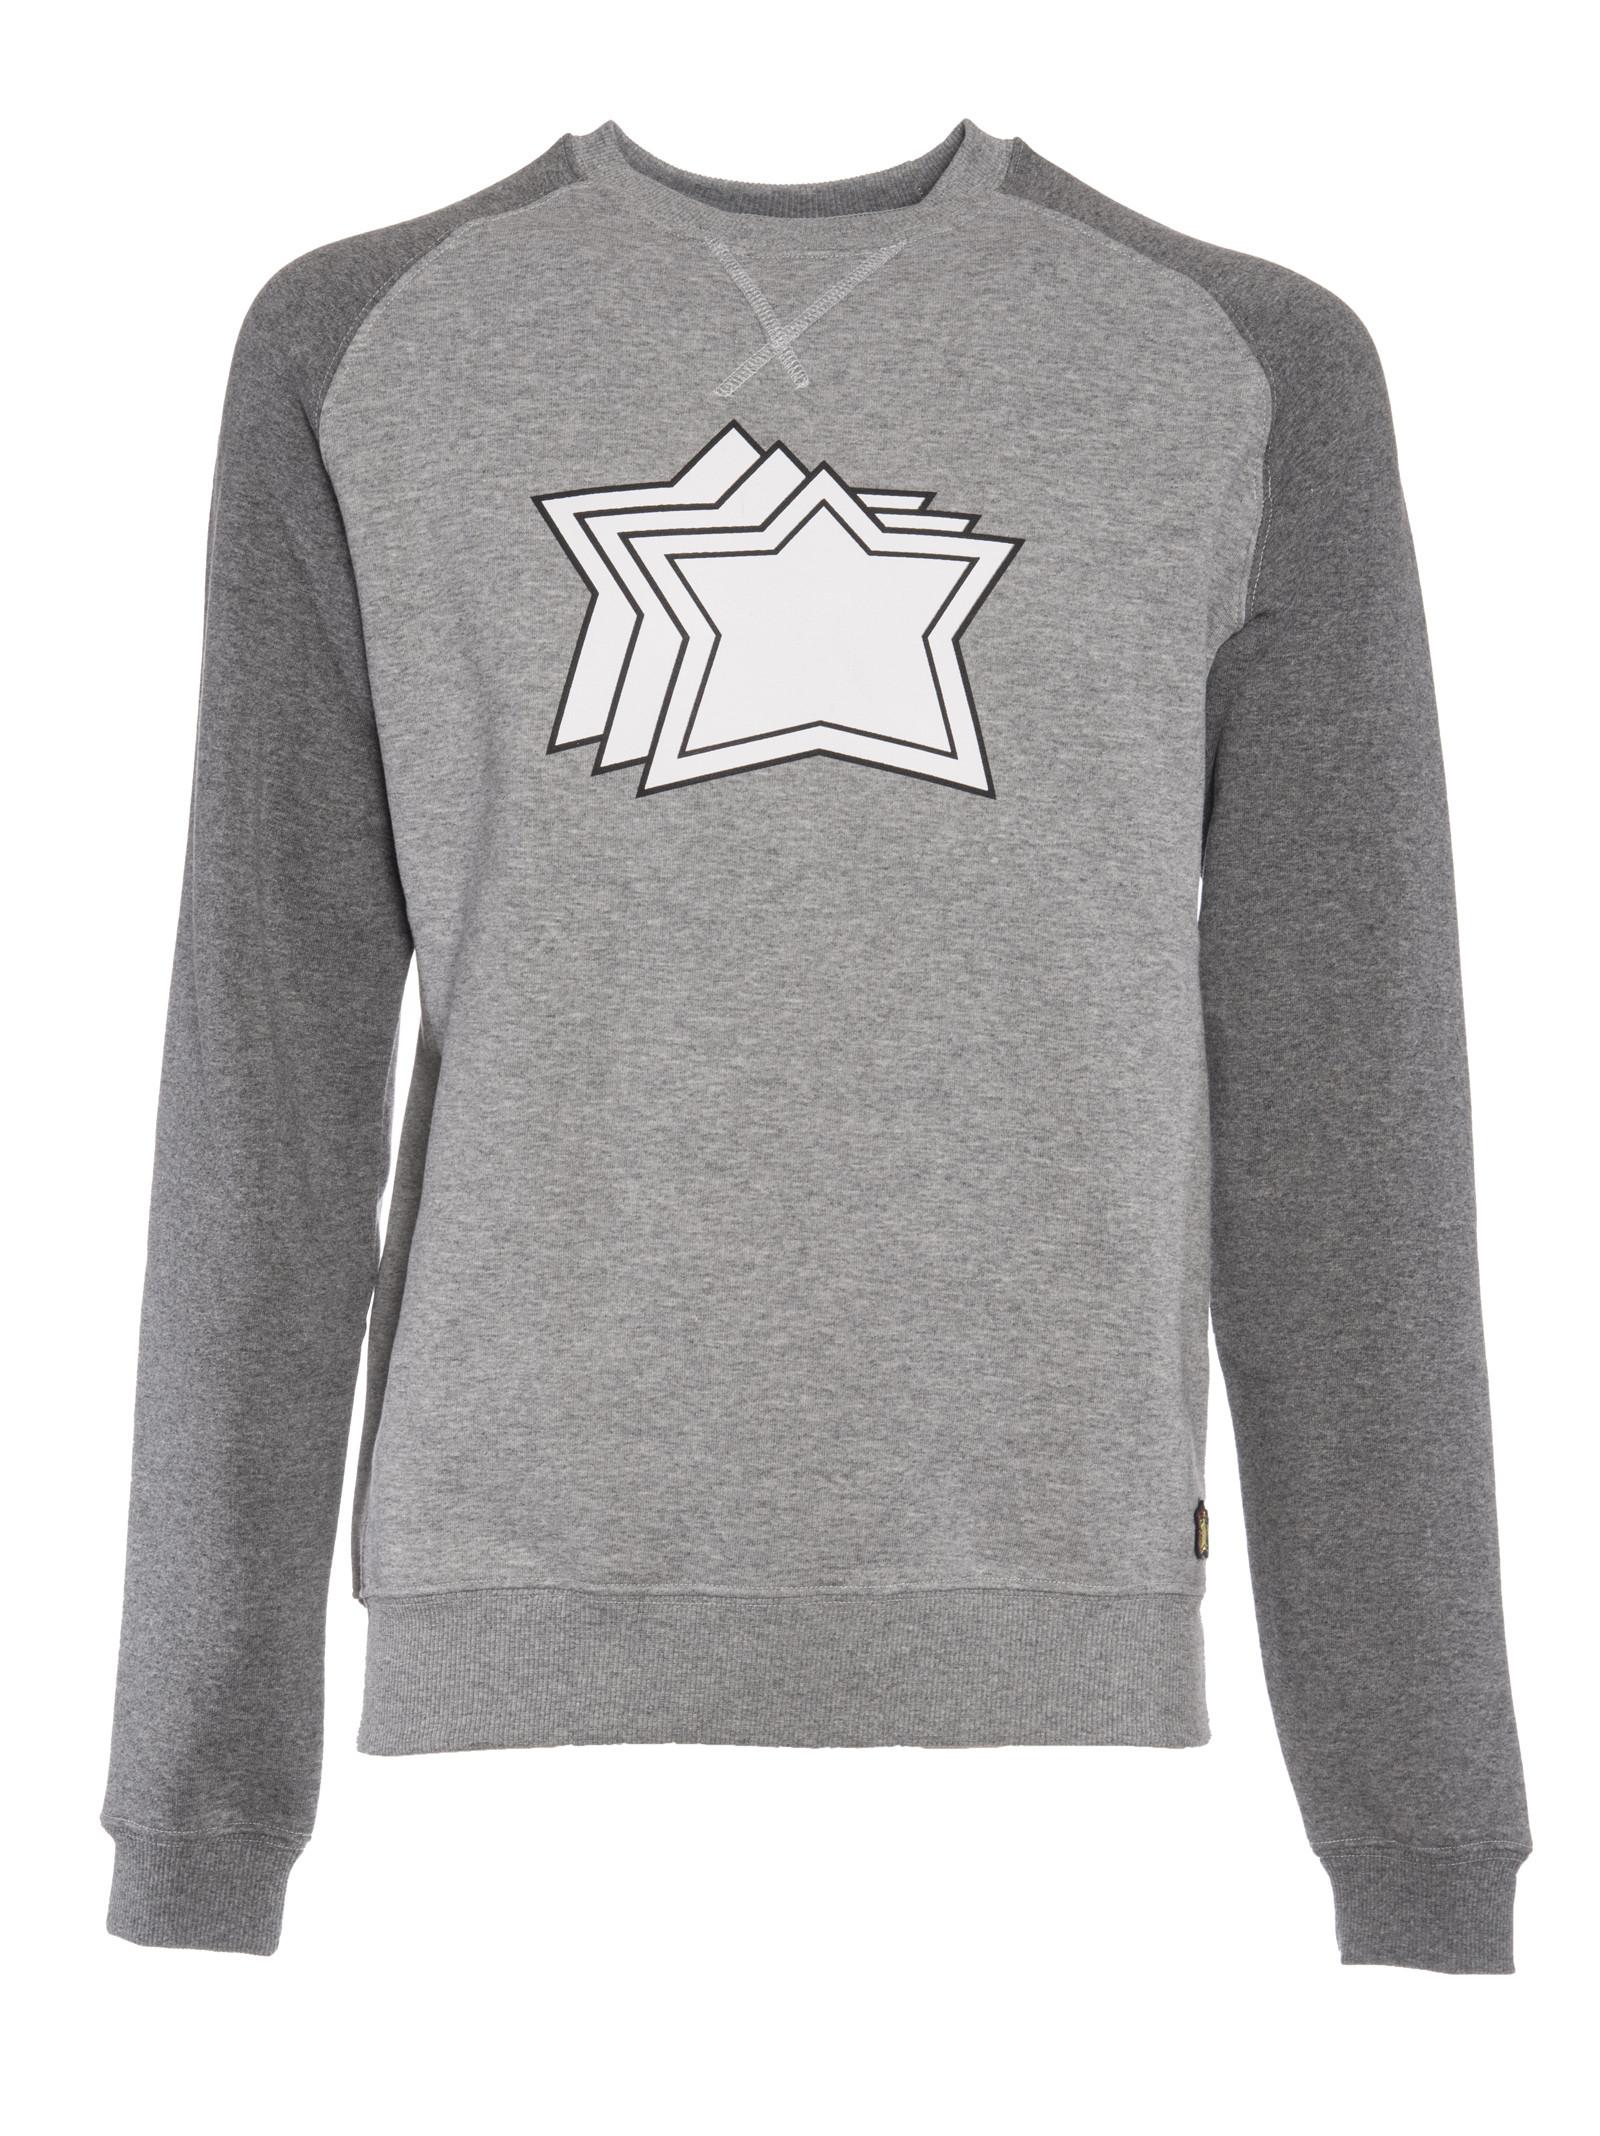 Atlantic Stars Brand Design Sweater